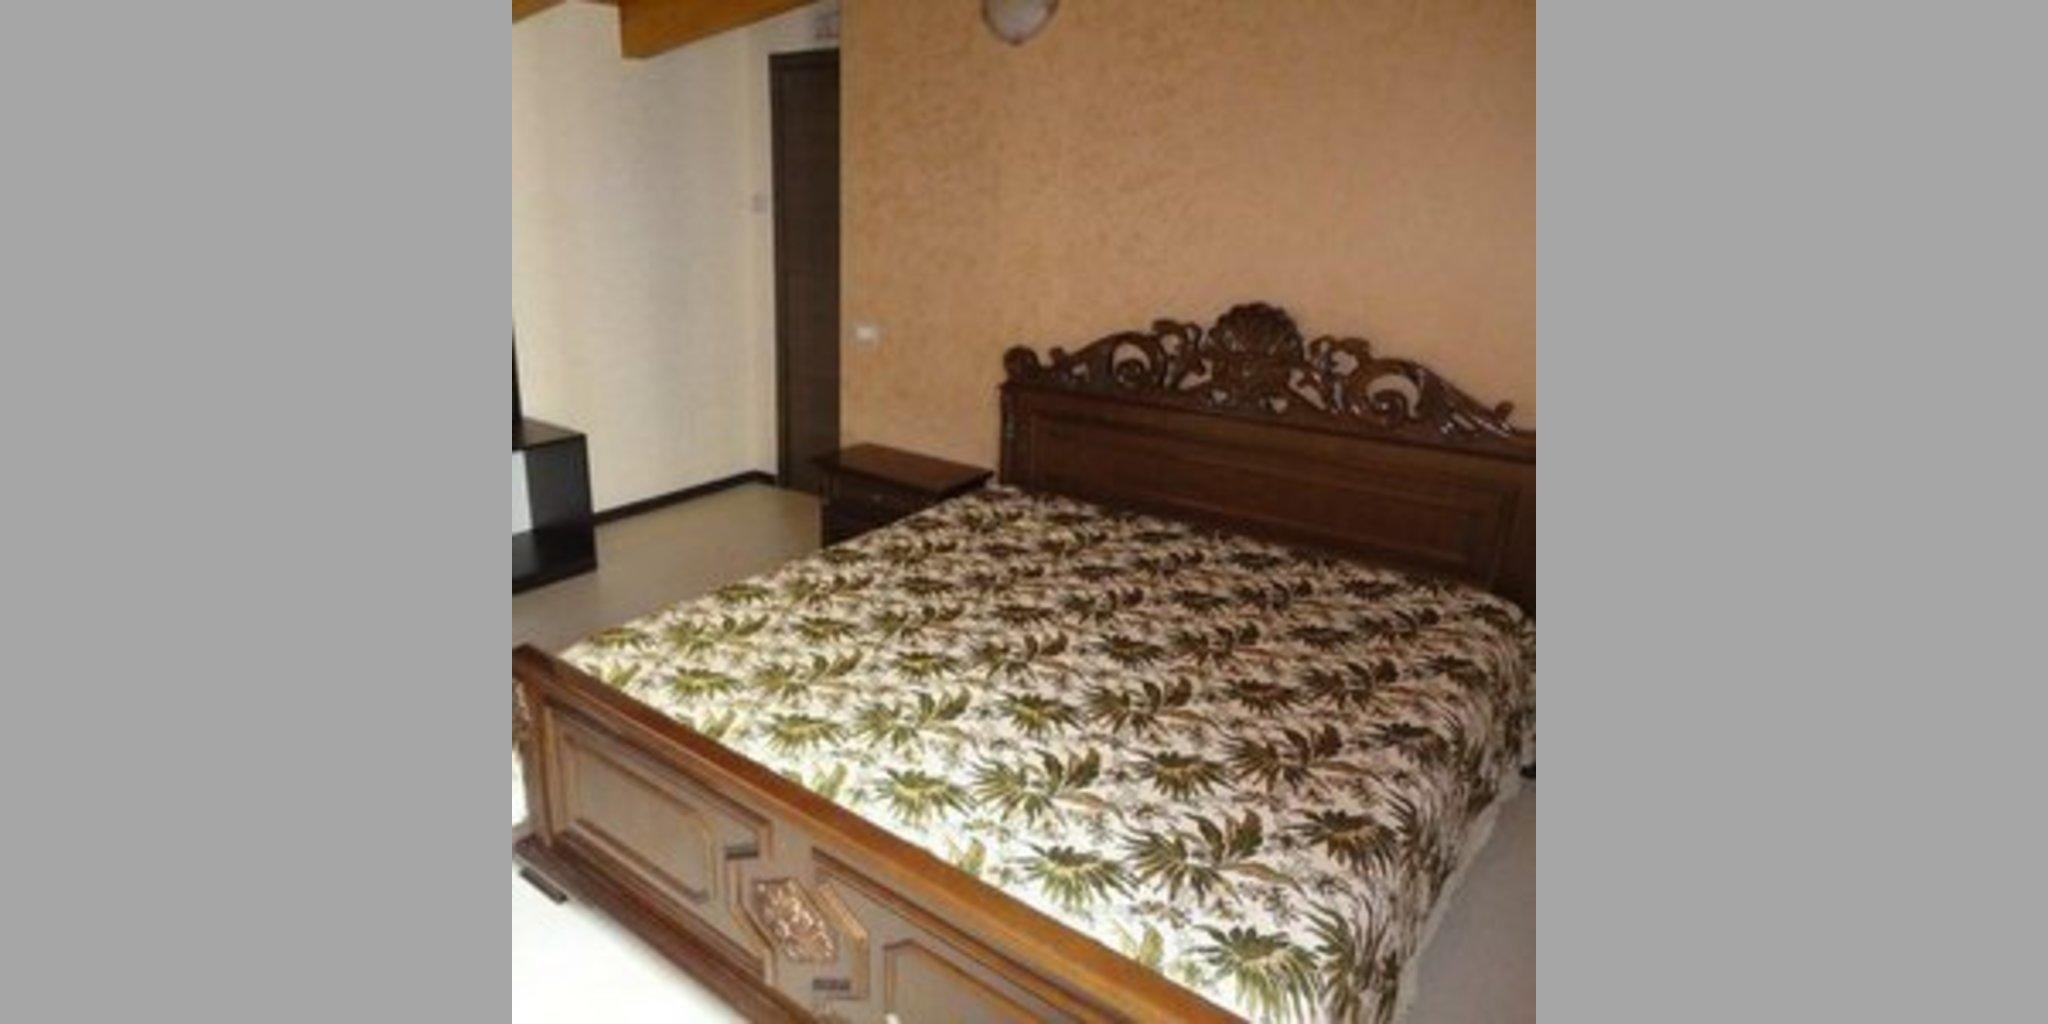 Bed & Breakfast Altamura - Altamura_A